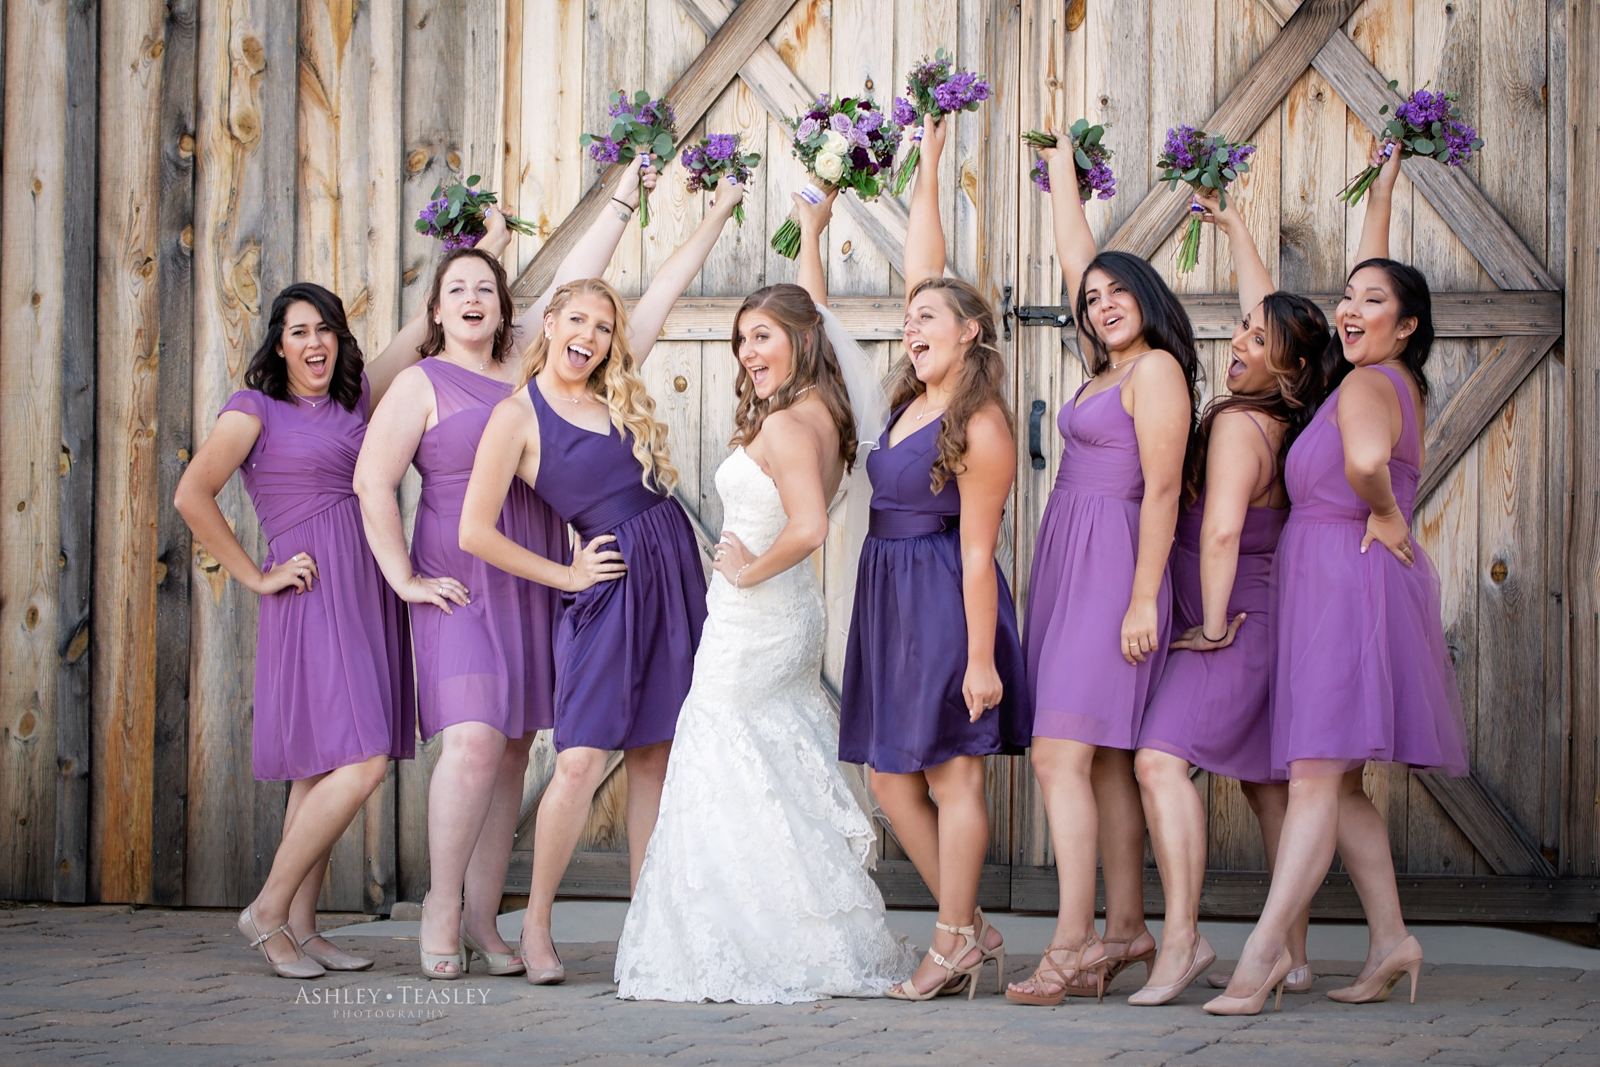 Ashley Teasley Photography - Amador Cellars Winery - Sacramento Wedding Photographer-127.JPG